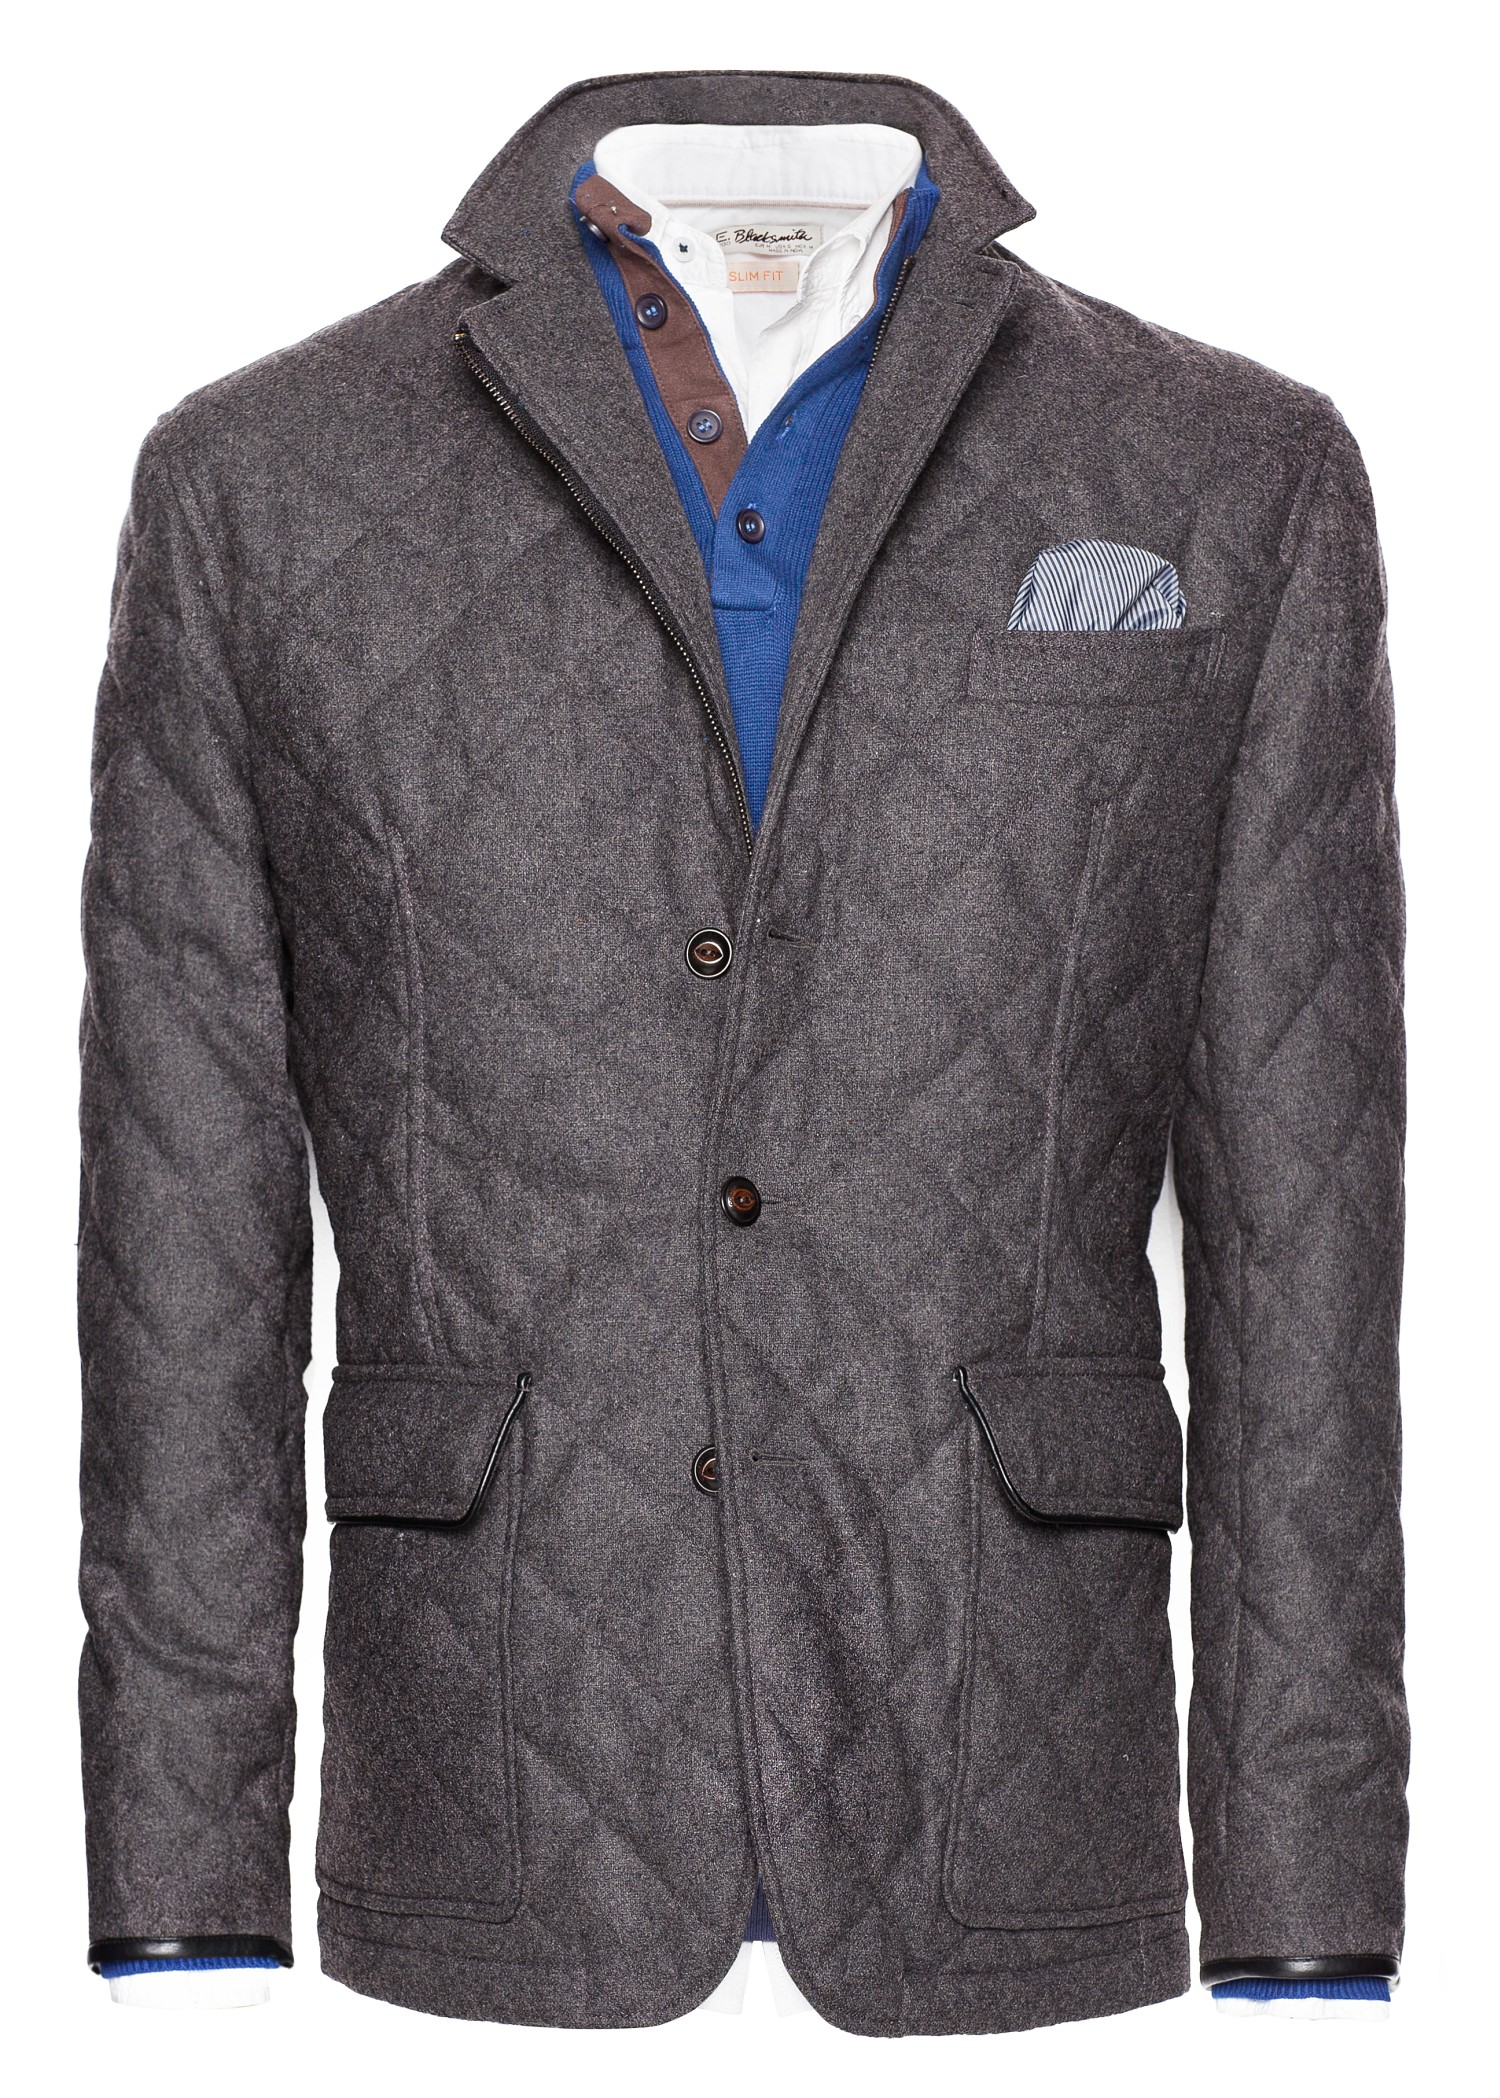 Mango Herringbone Husky Jacket In Dark Grey Gray For Men